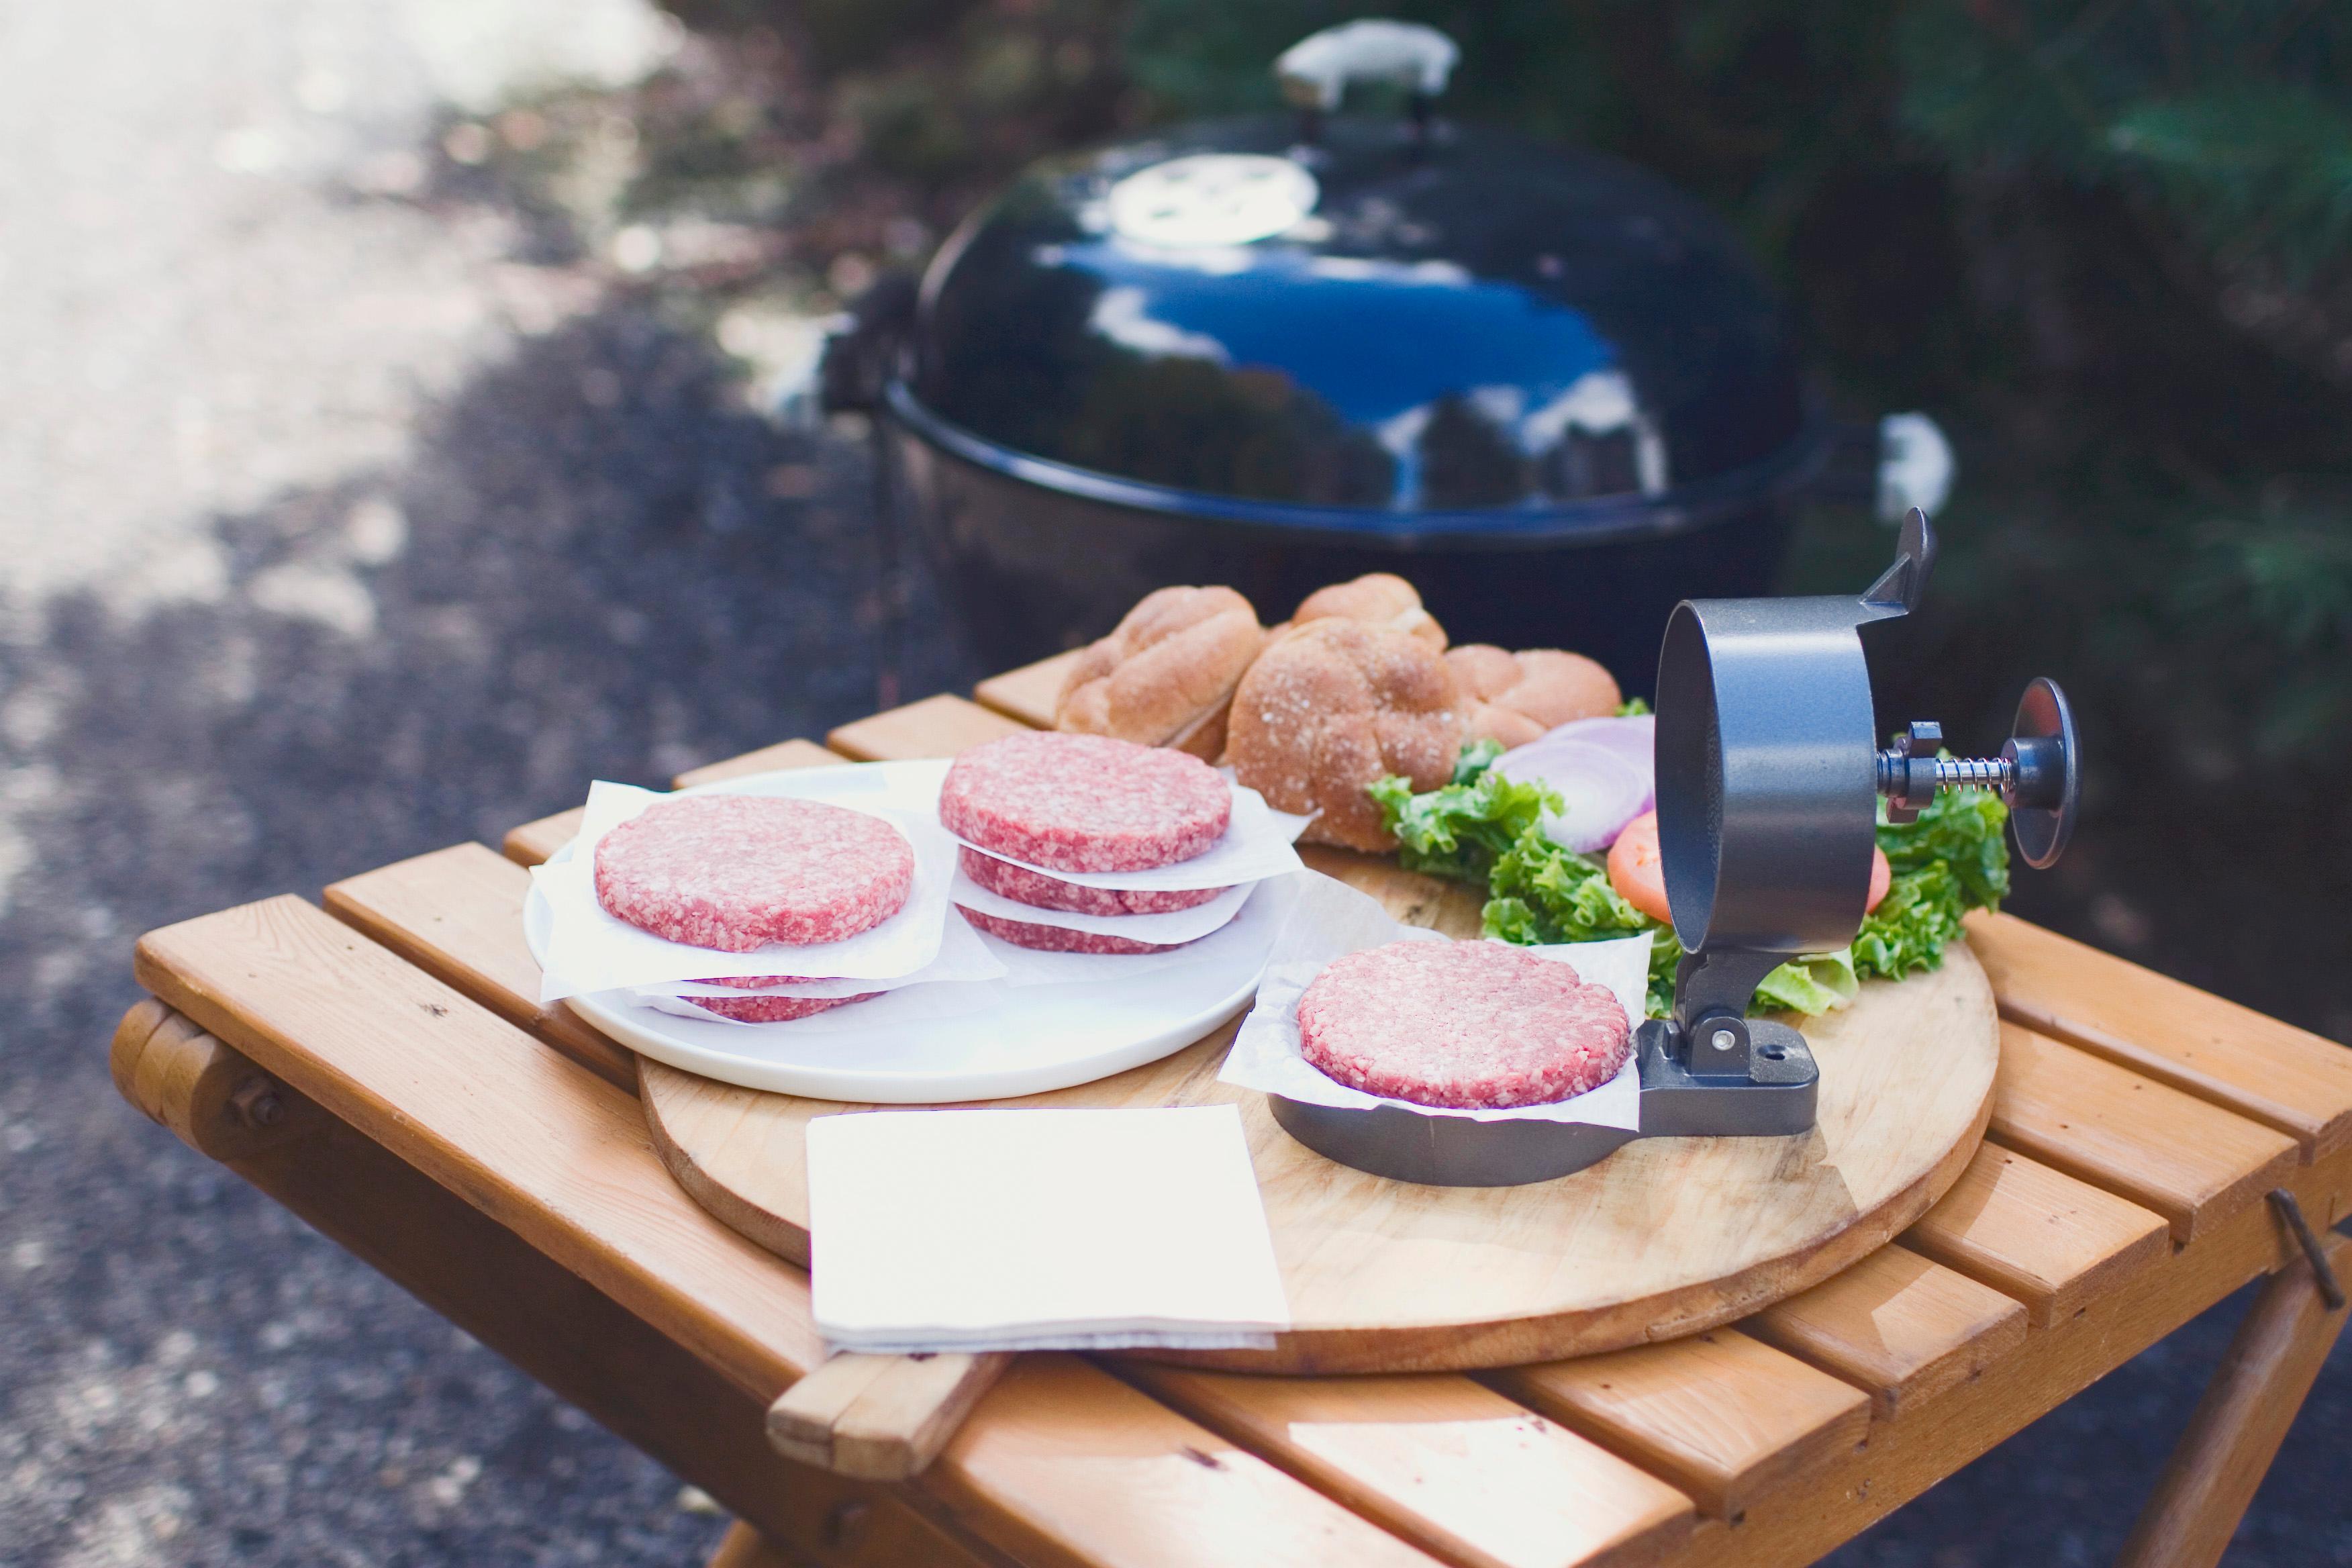 Home, Furniture & DIY > Cookware, Dining & Bar > Food Preparation ...